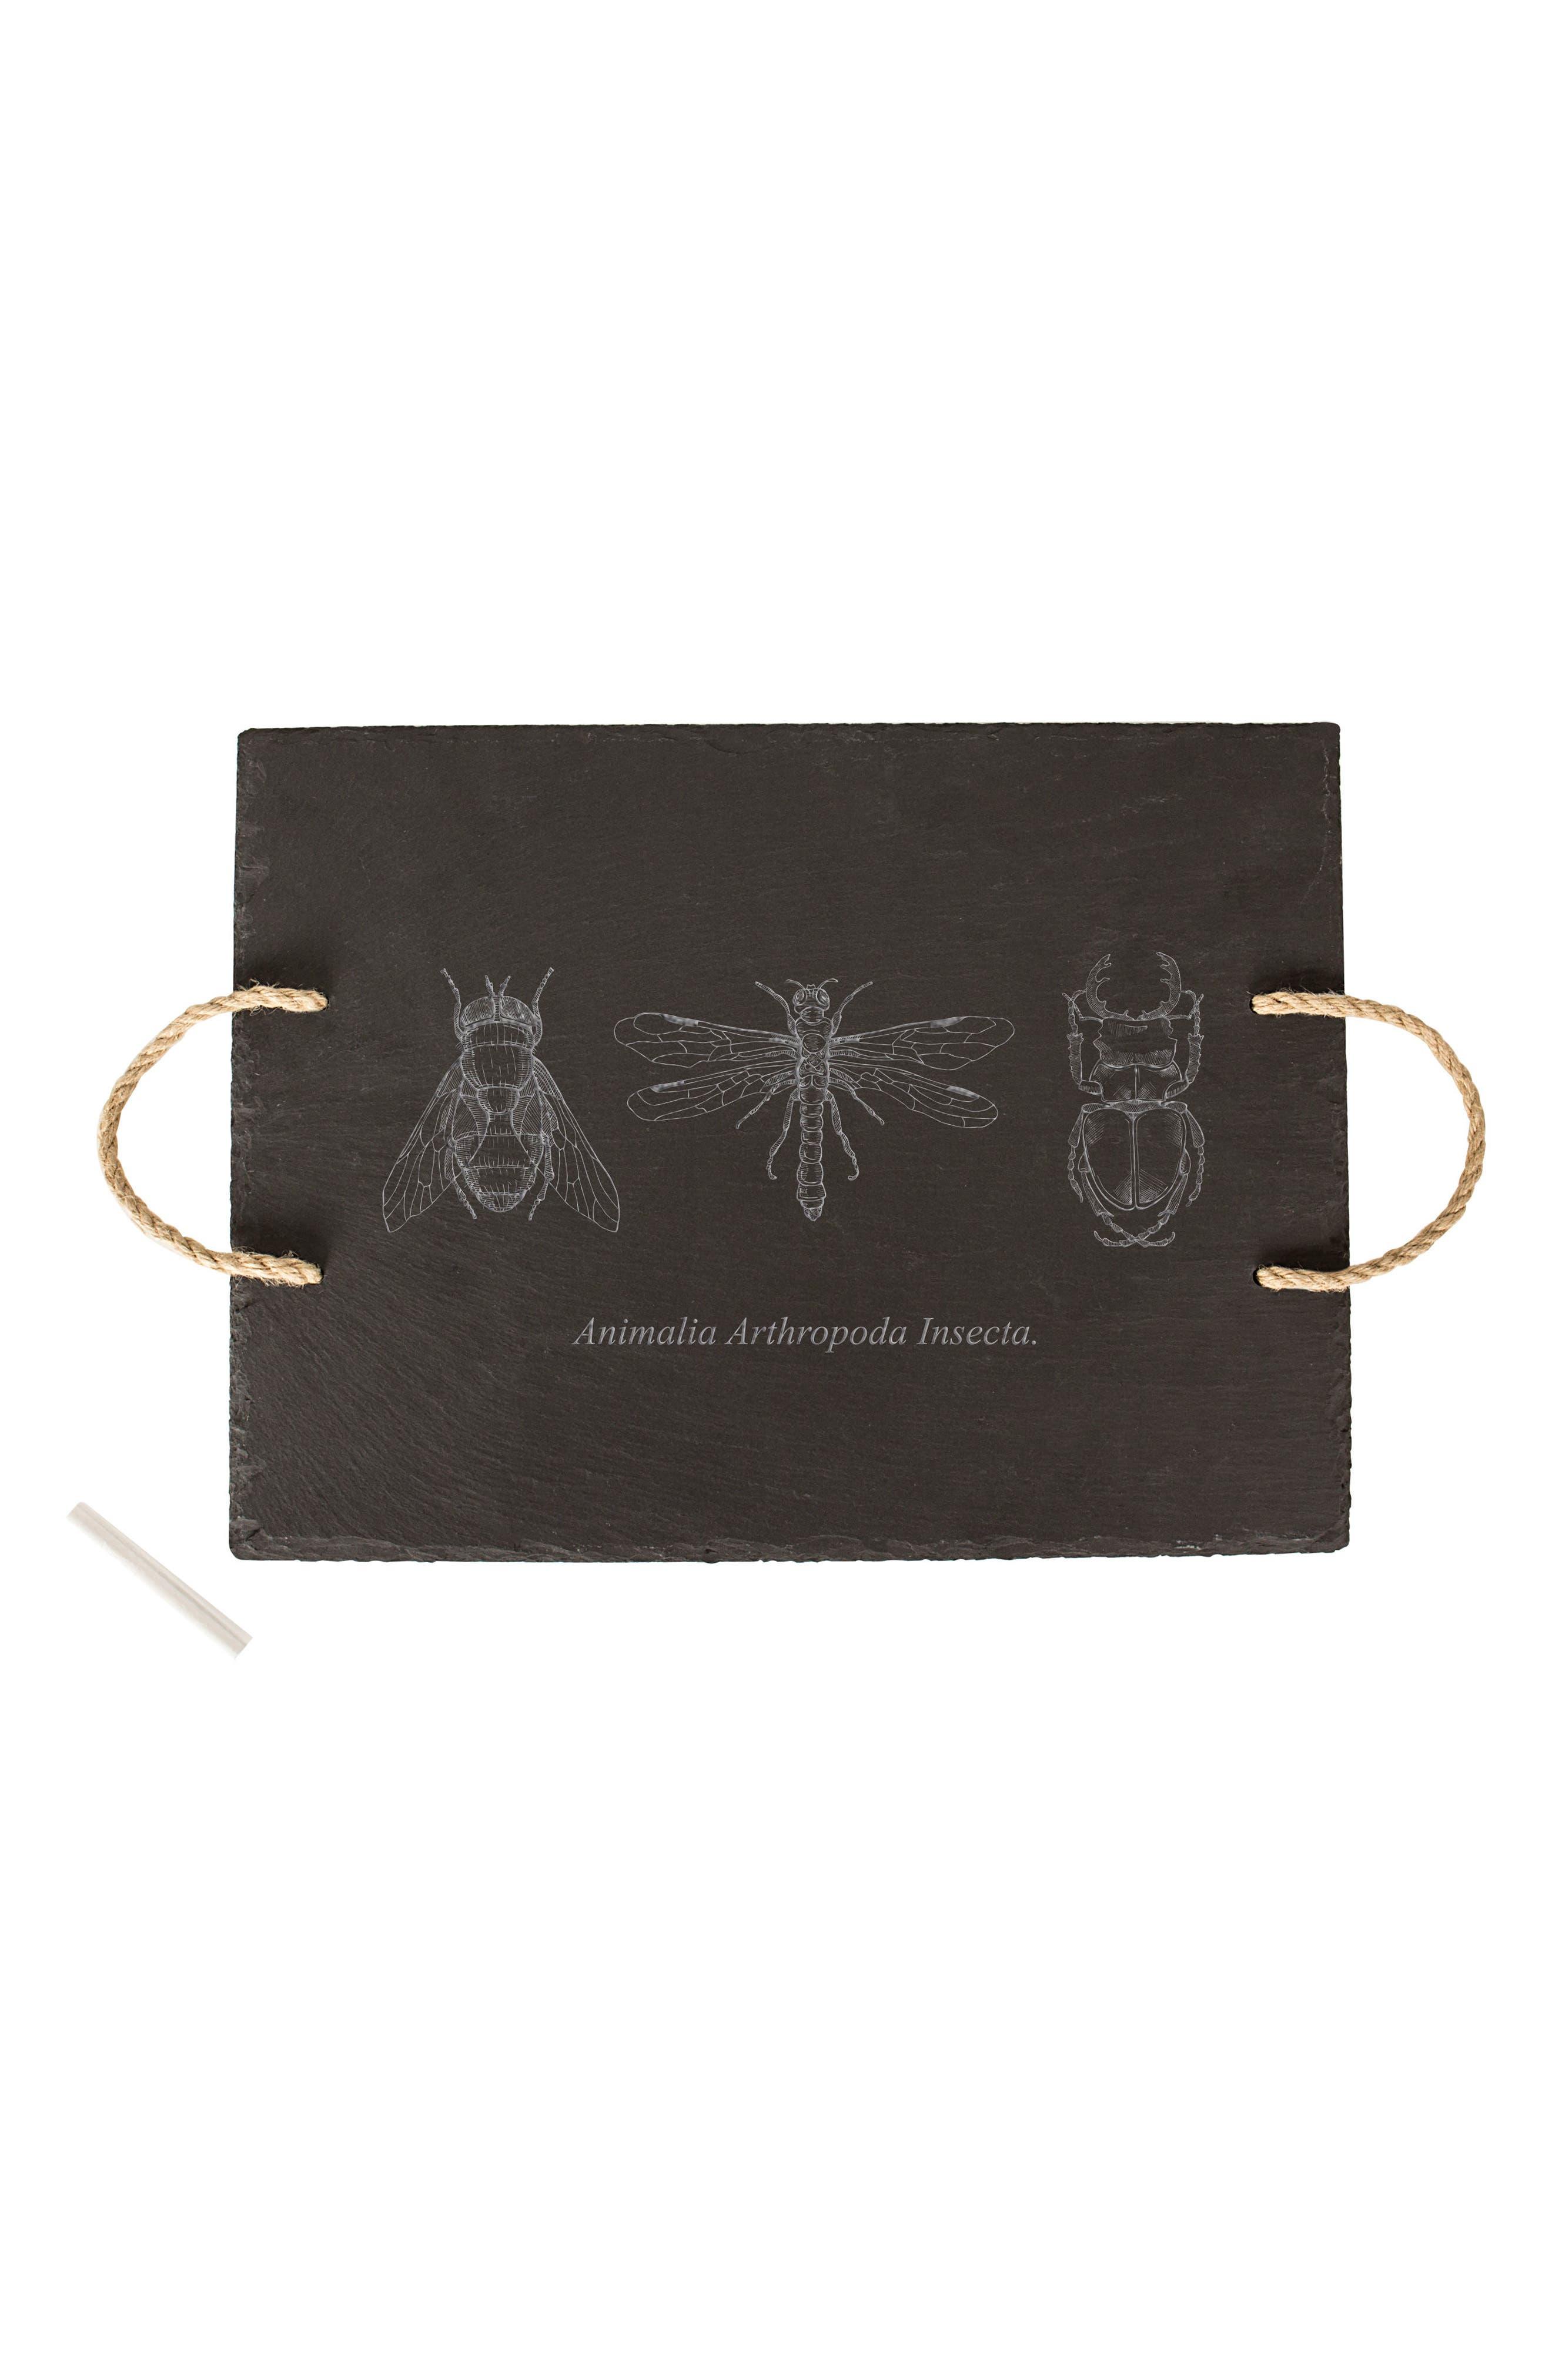 Insect Slate Tray,                             Main thumbnail 1, color,                             001